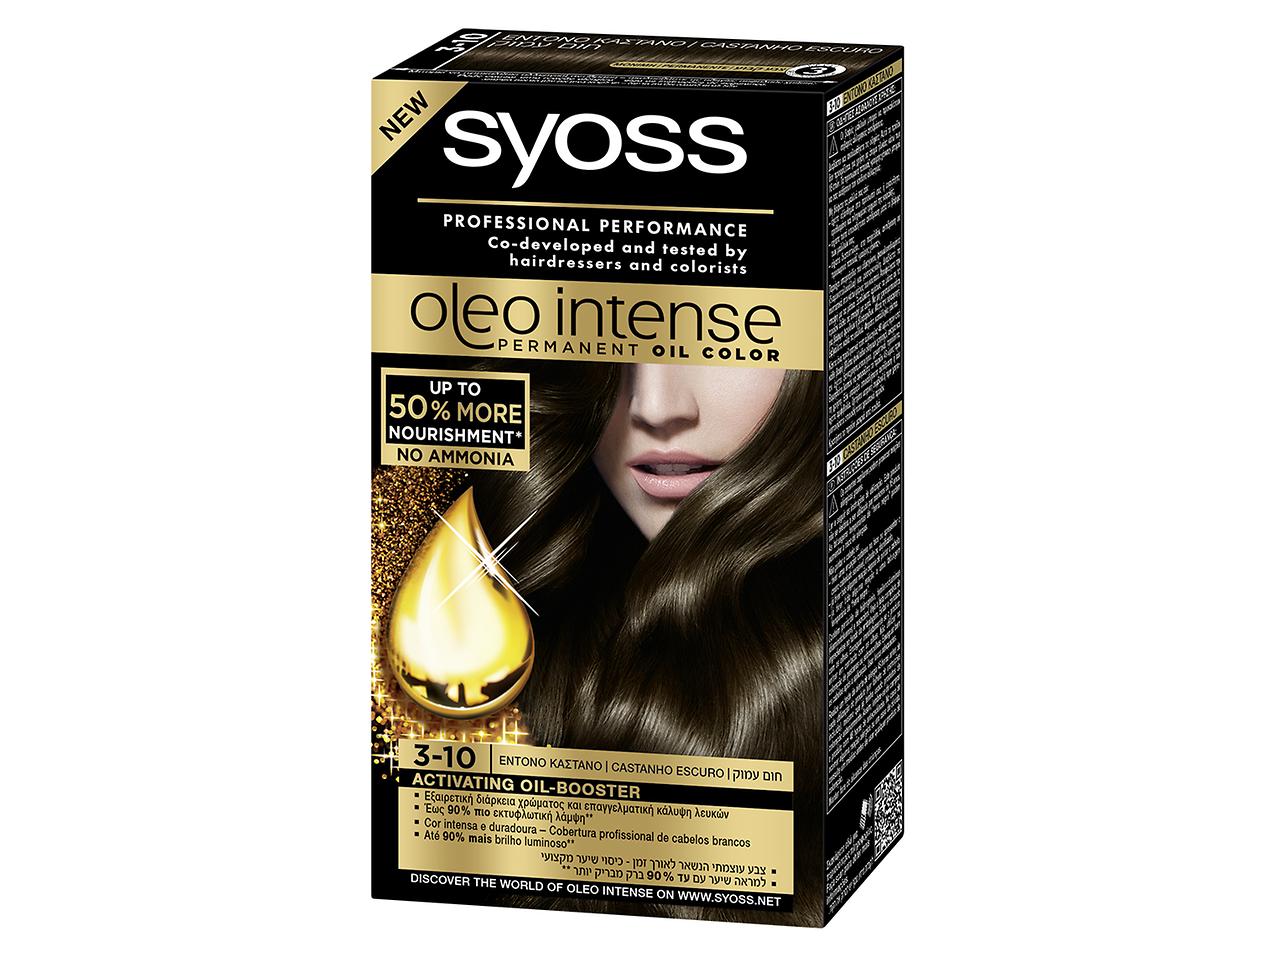 Syoss Oleo Intense 3-10 Castanho escuro